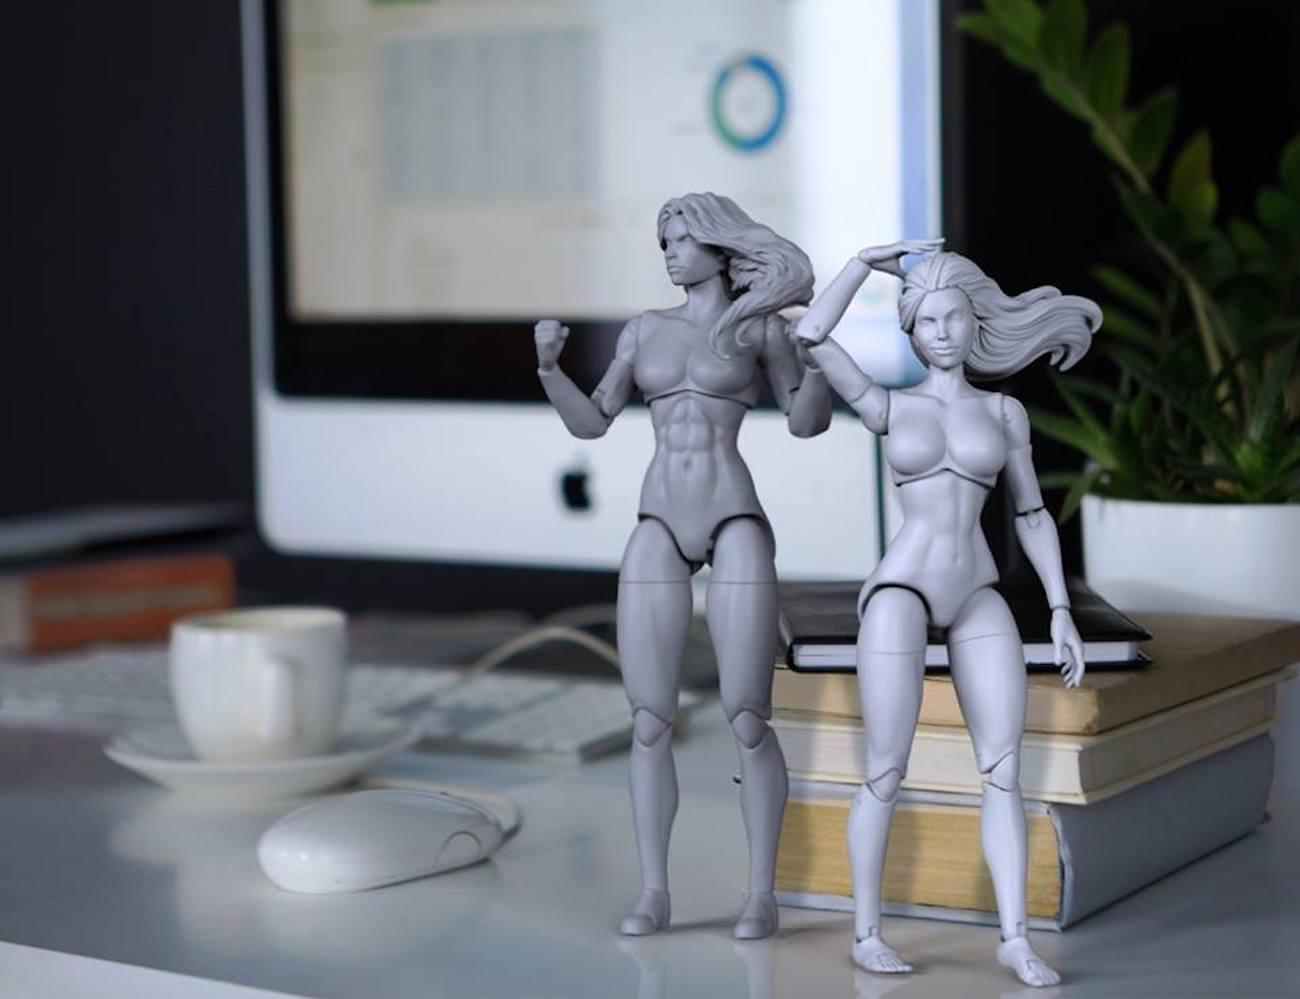 Superheroine Blank Female Action Figures